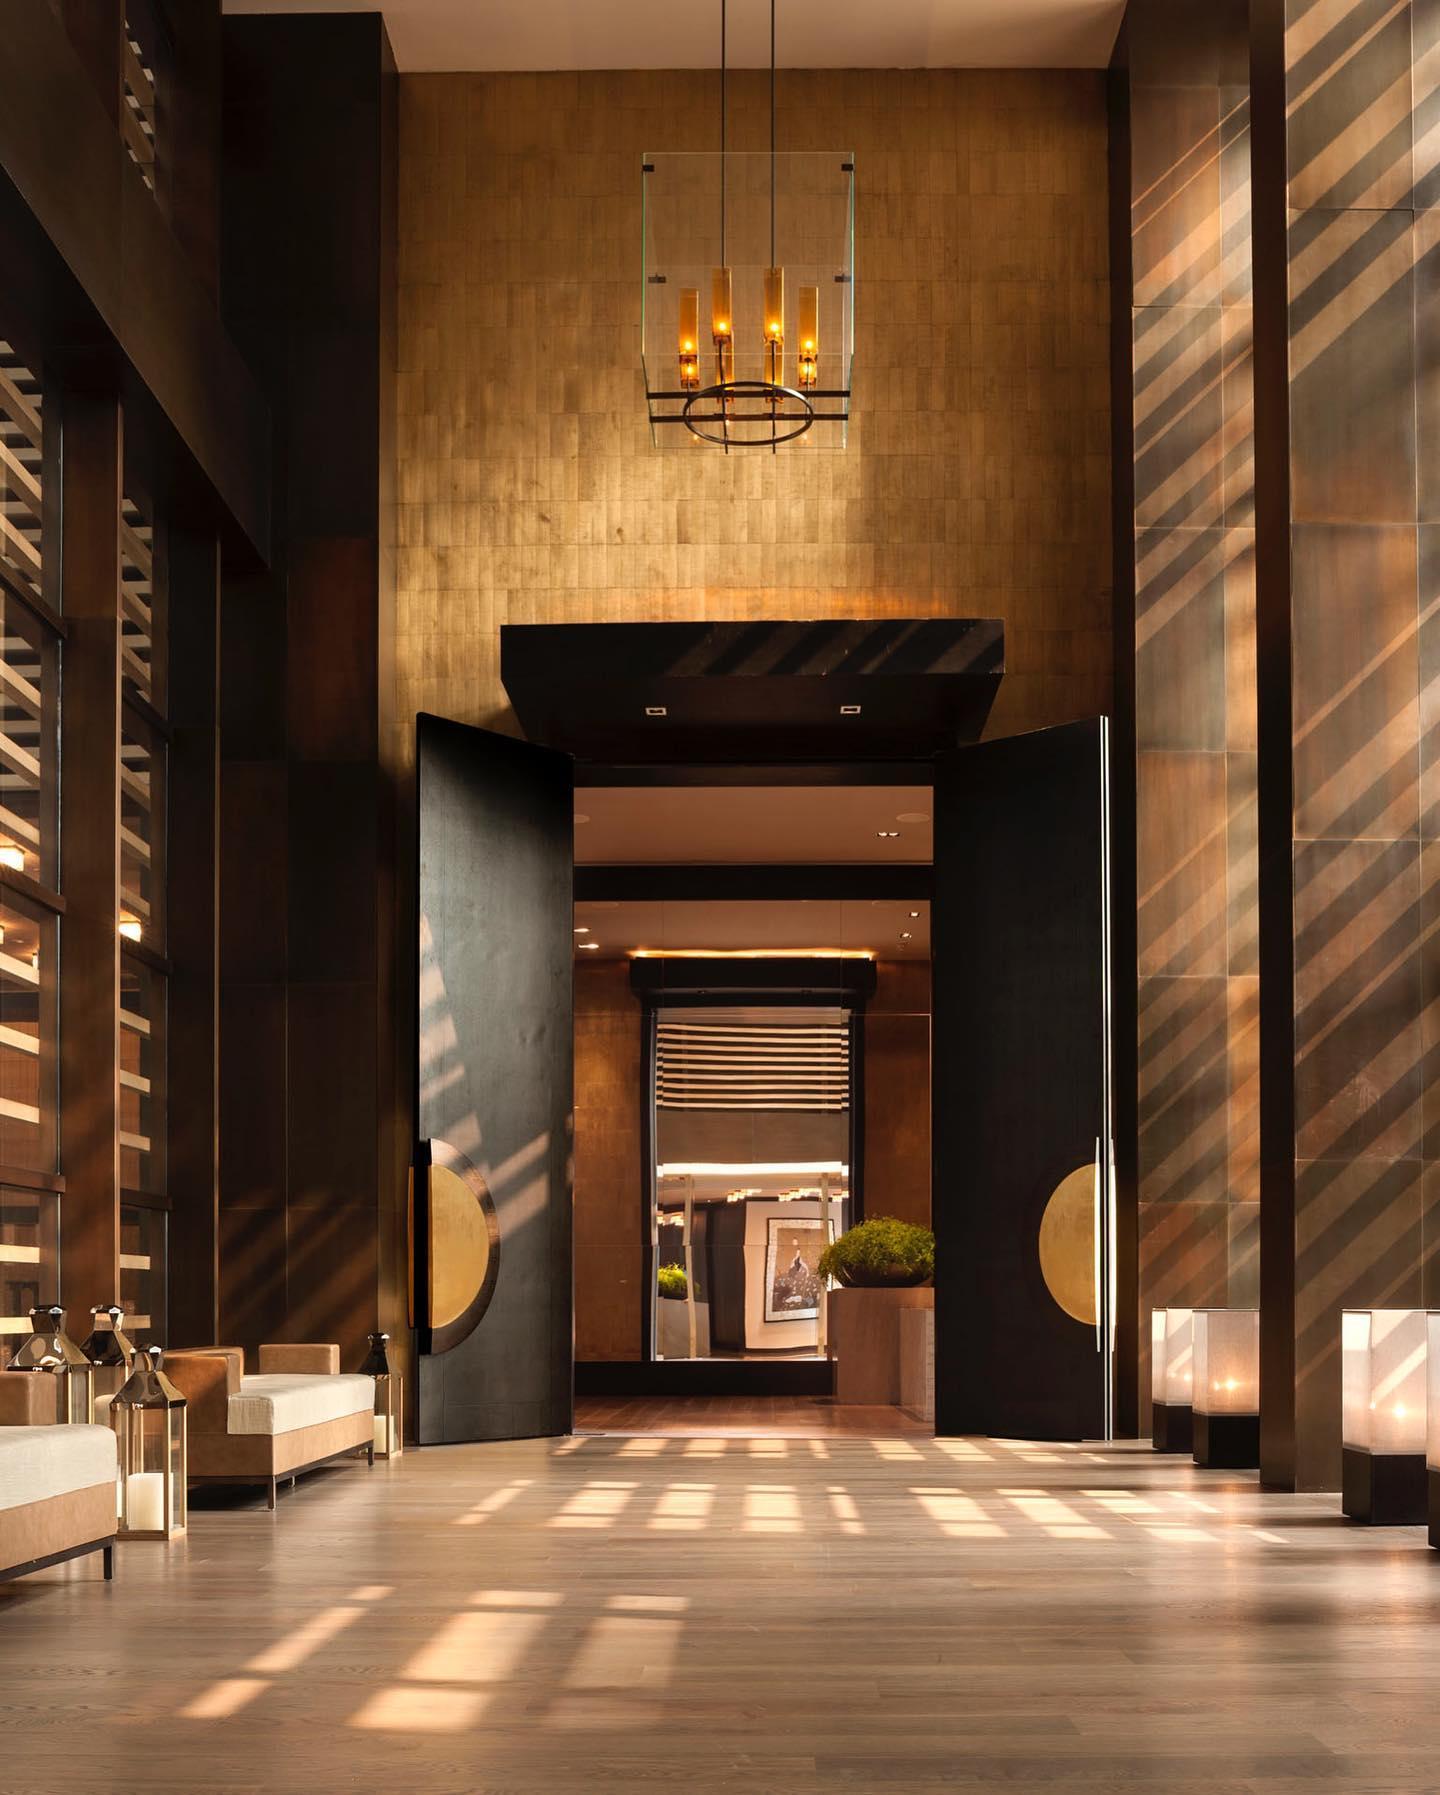 Rosewood Beijing, luna de miel en China, hoteles para luna de miel en China - Wedding Hub - 014